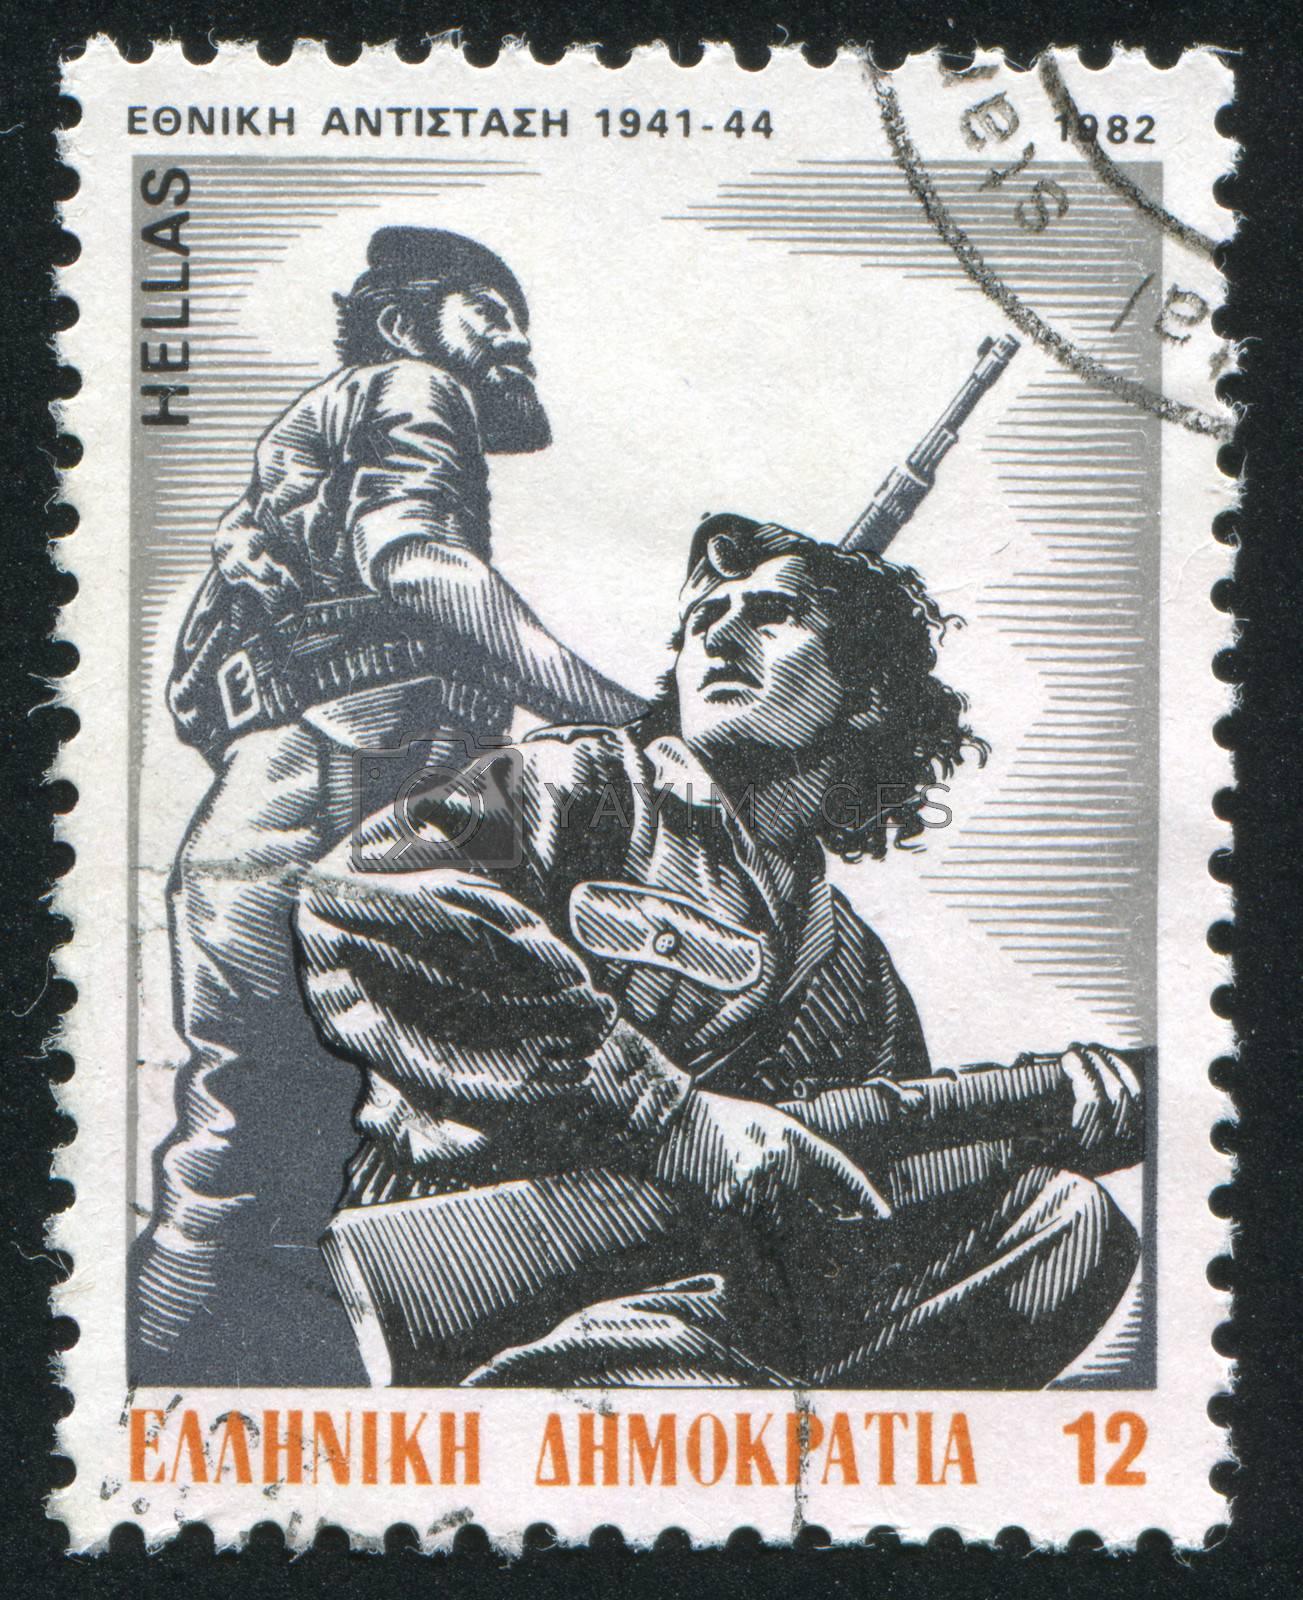 GREECE - CIRCA 1982: stamp printed by Greece, shows Partisan men and women, by P. Gravalos, circa 1982